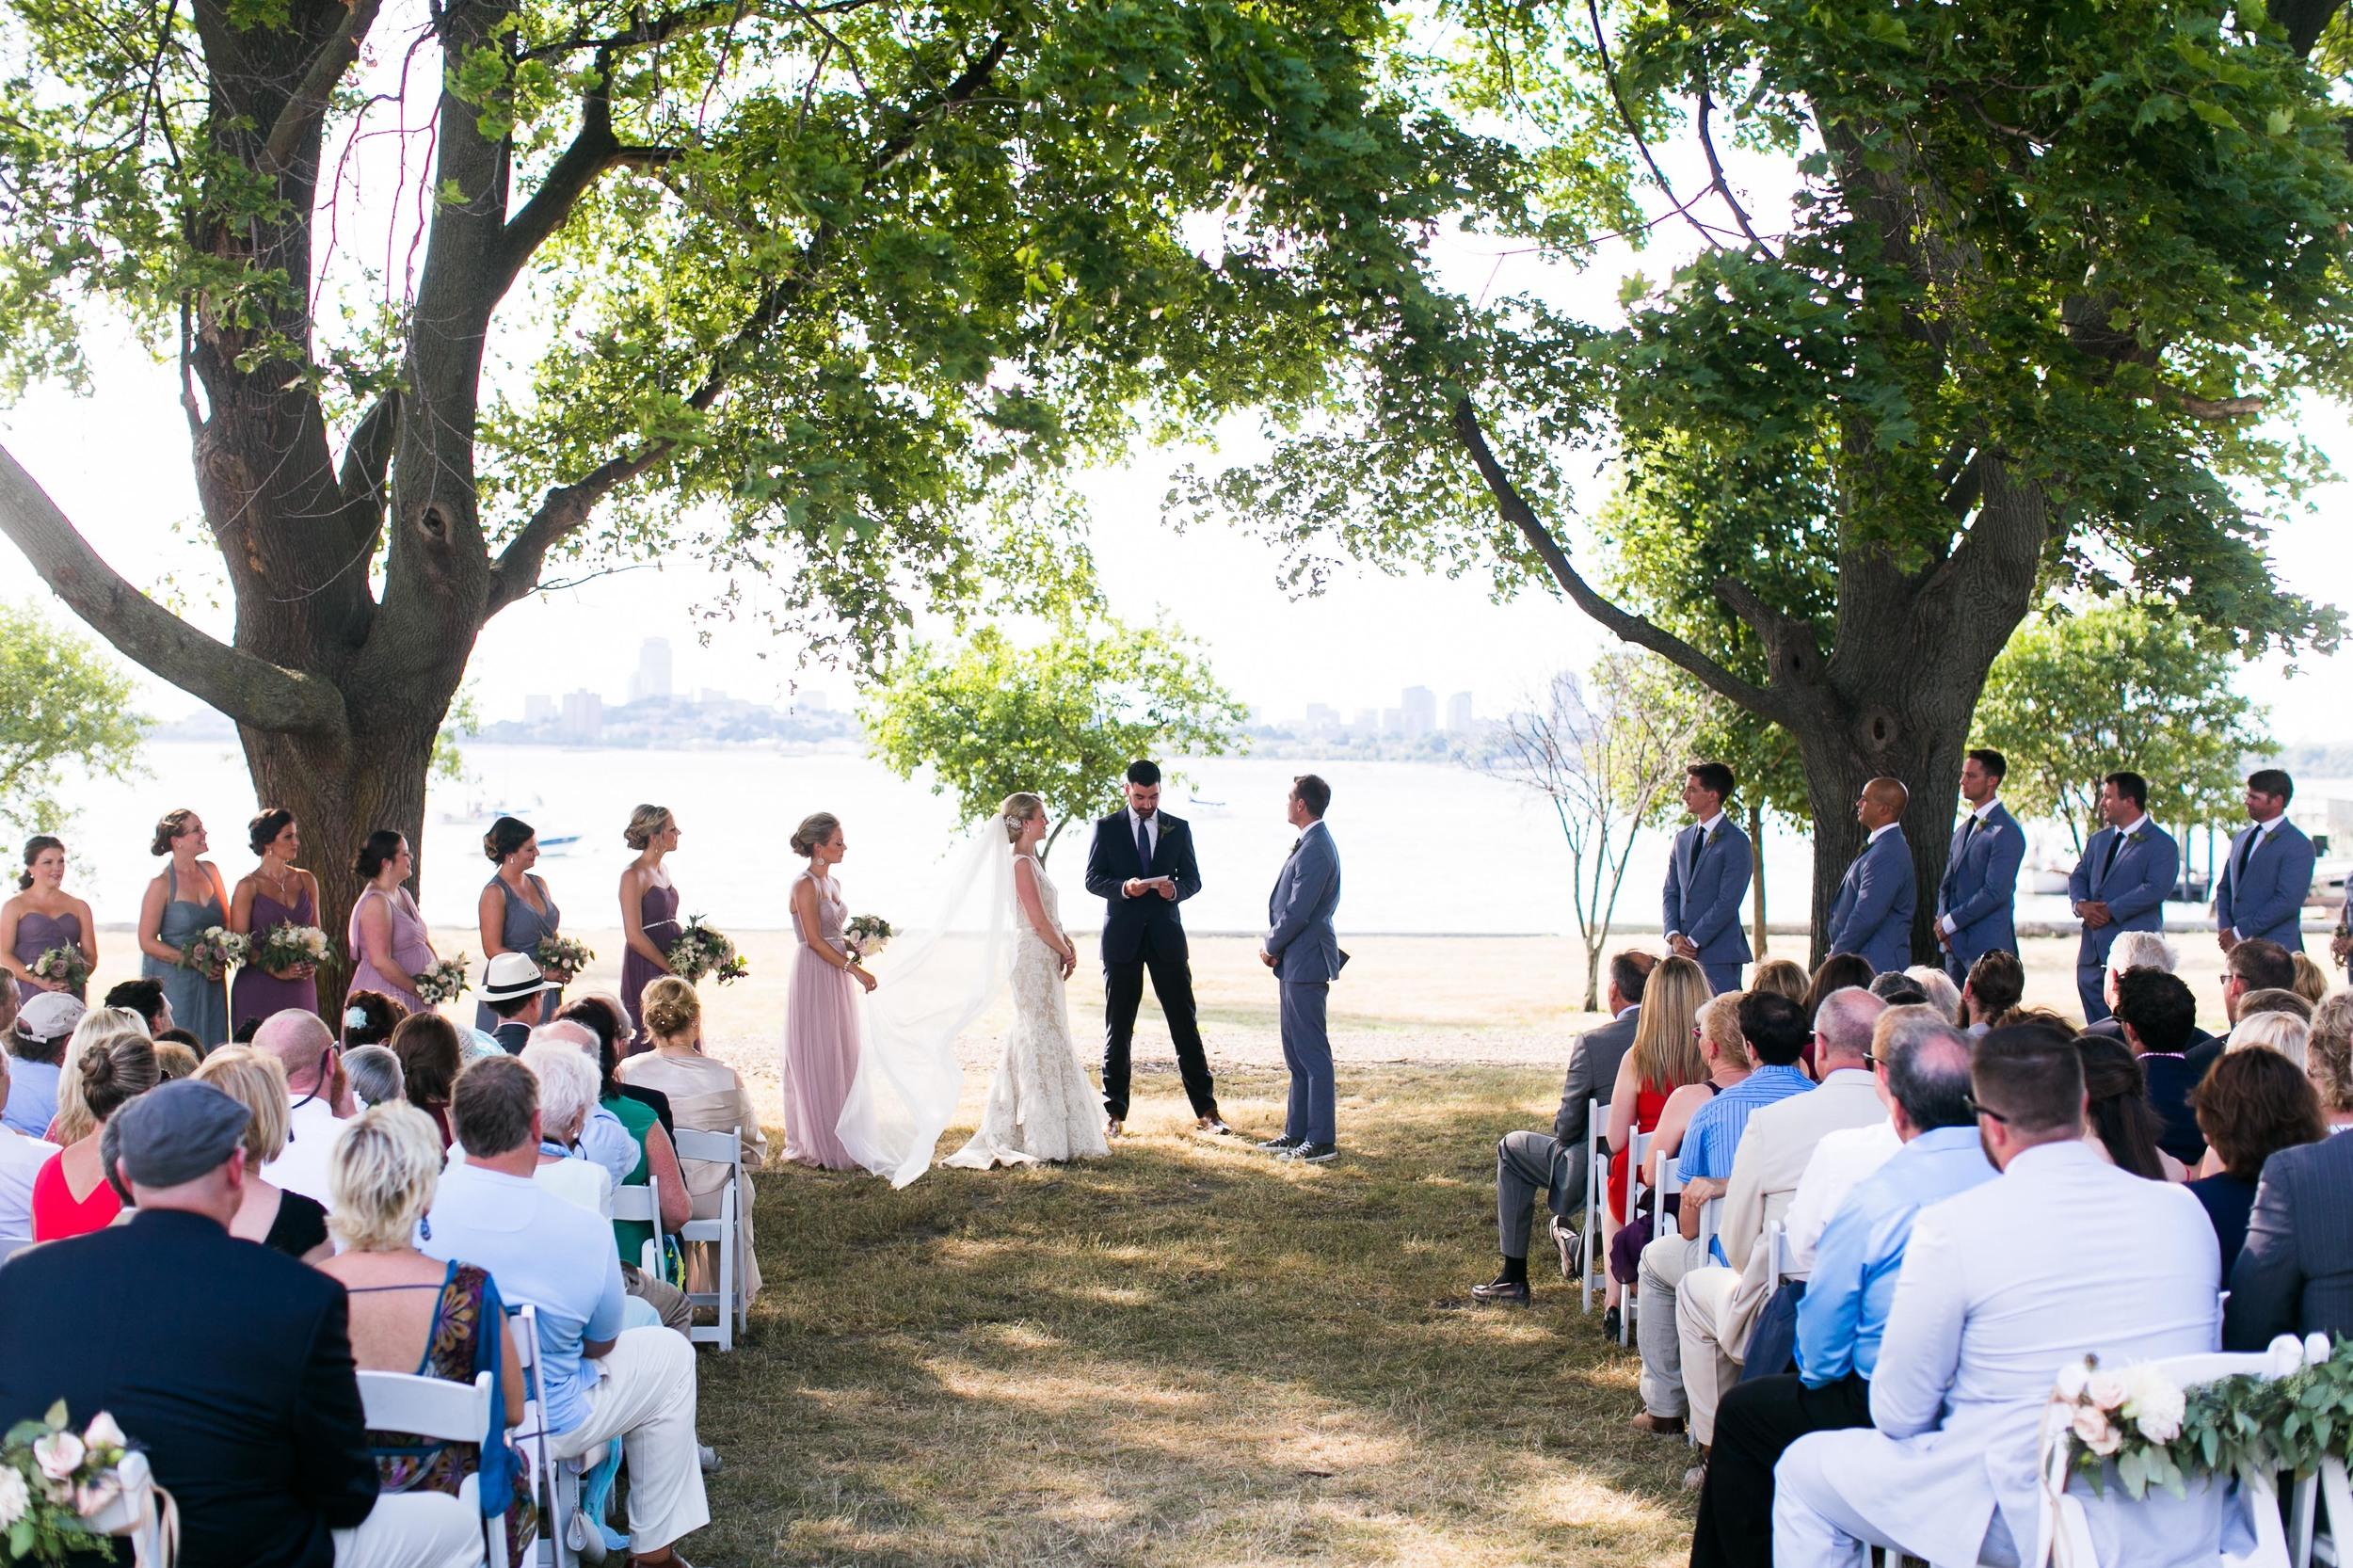 thompson-island-wedding-ceremony